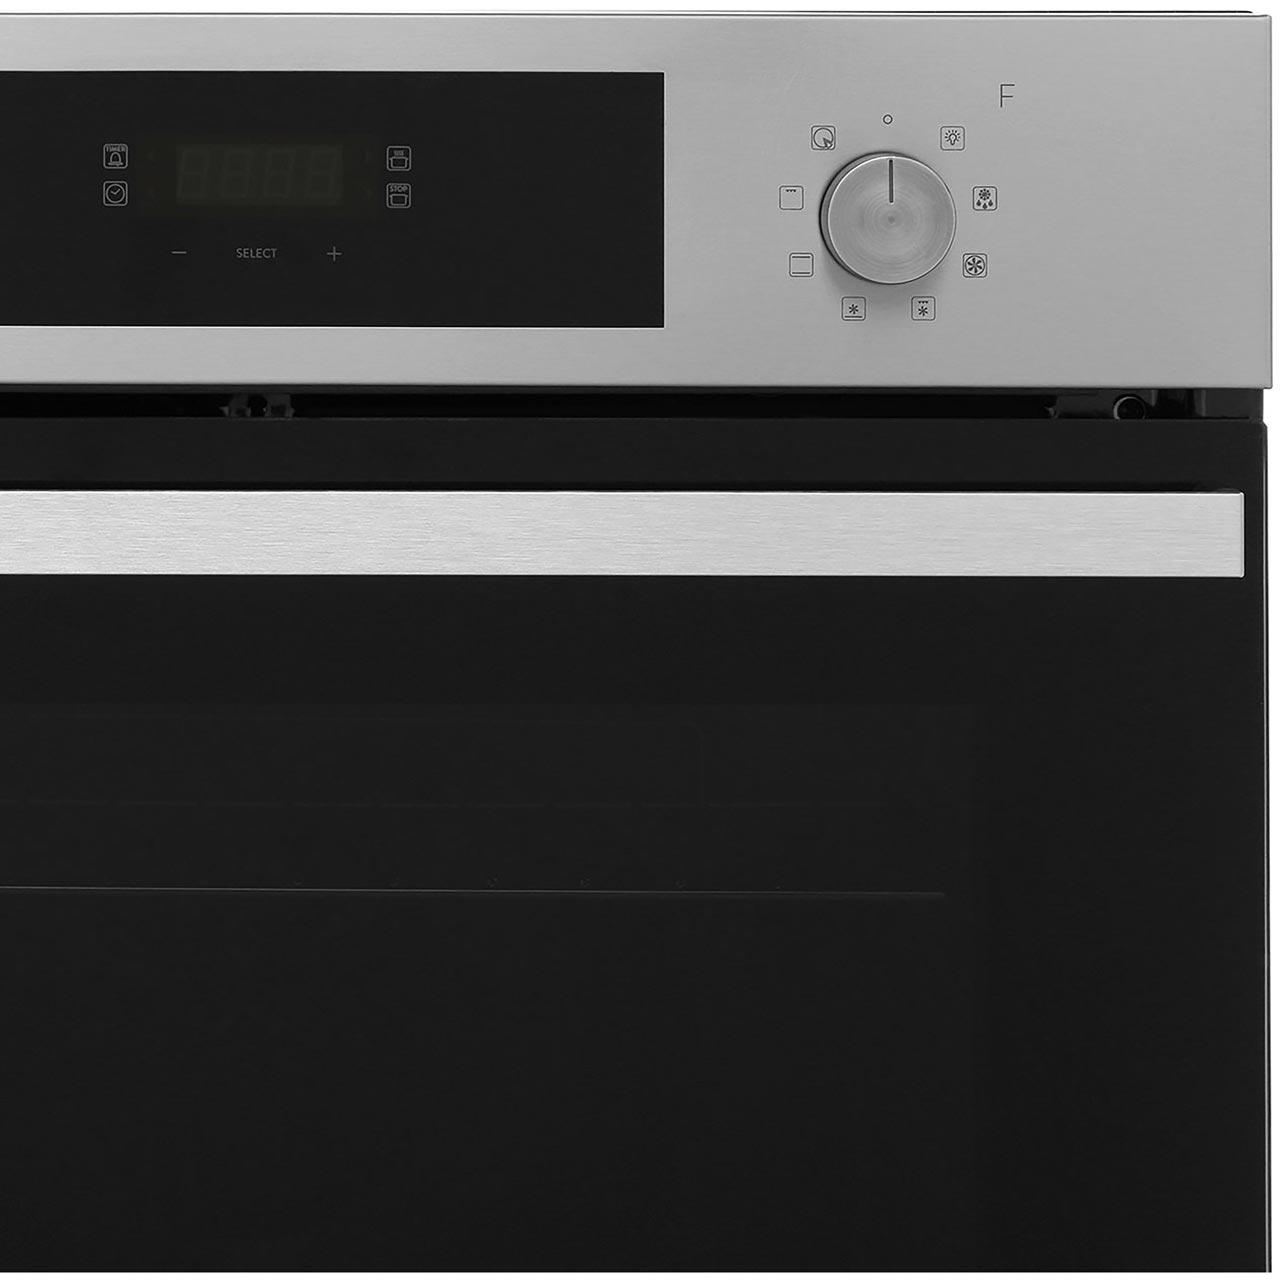 Uncategorized Baumatic Kitchen Appliances baumatic brands by appliance world kitchen appliances boots washing machines fridges more